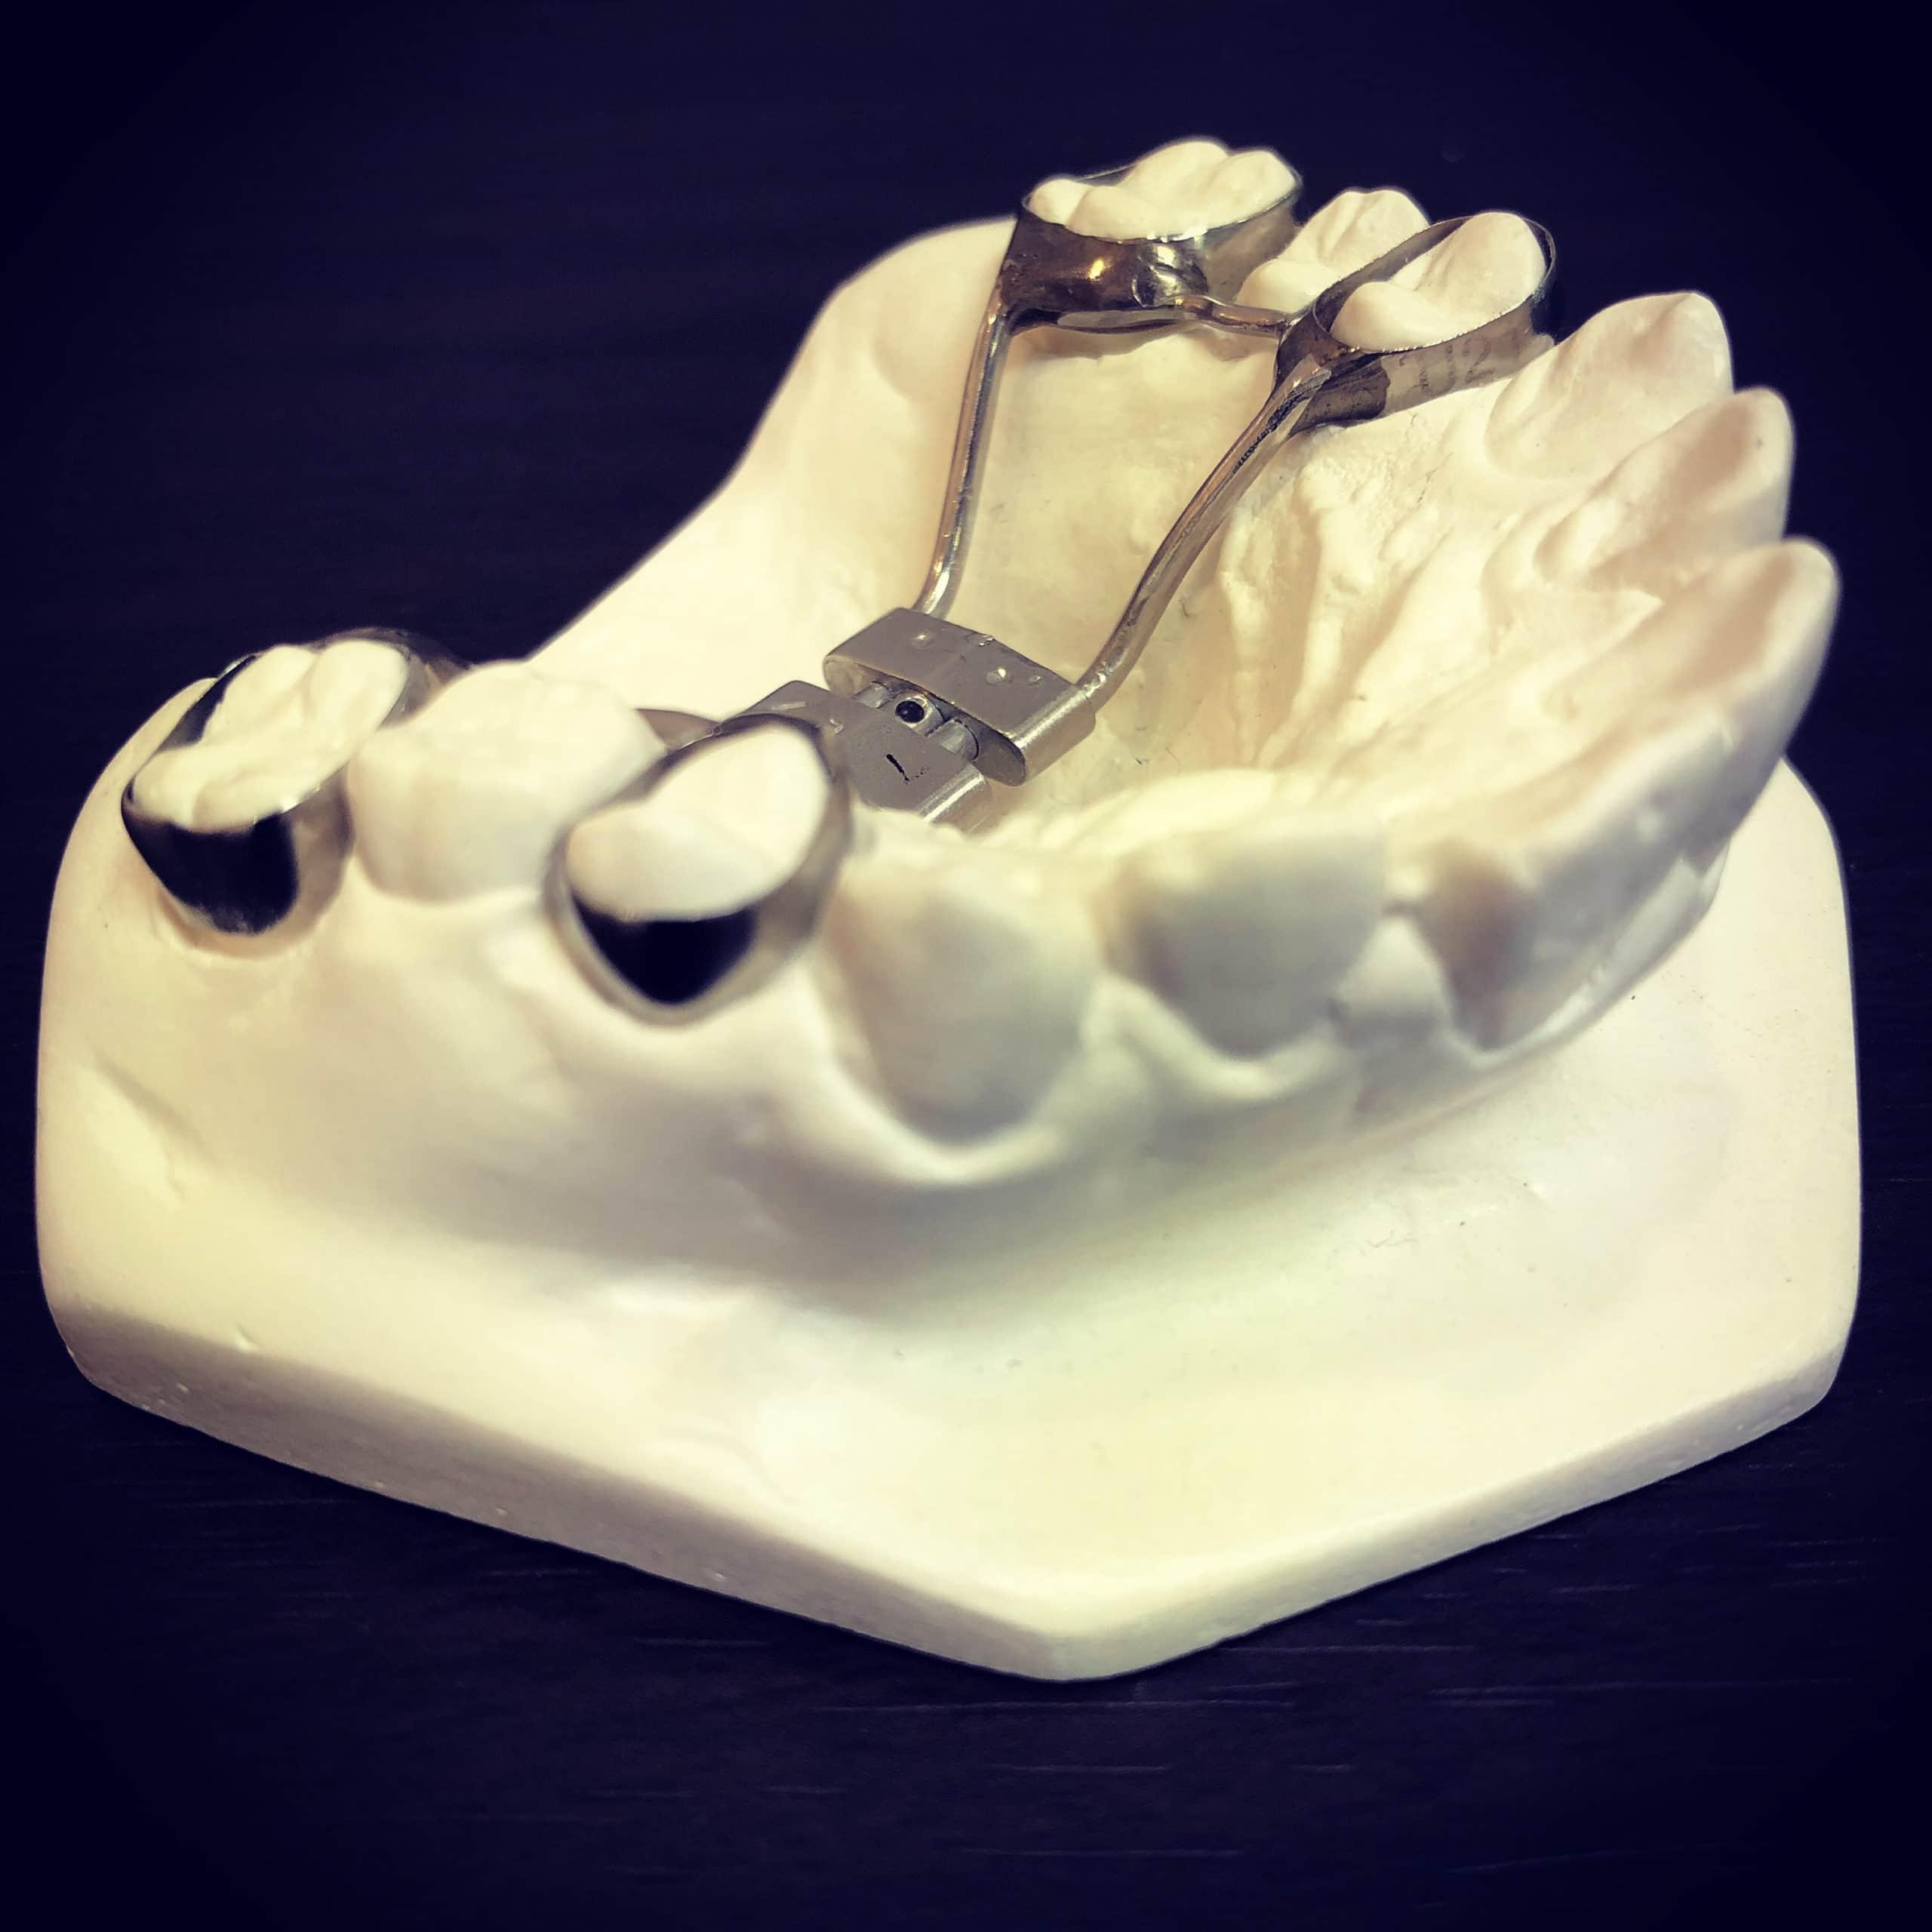 Orthodontic expander | Dr Sepi Torkan orthodontist in Redmond, Bellevue, Woodinville and Kirkland,WA